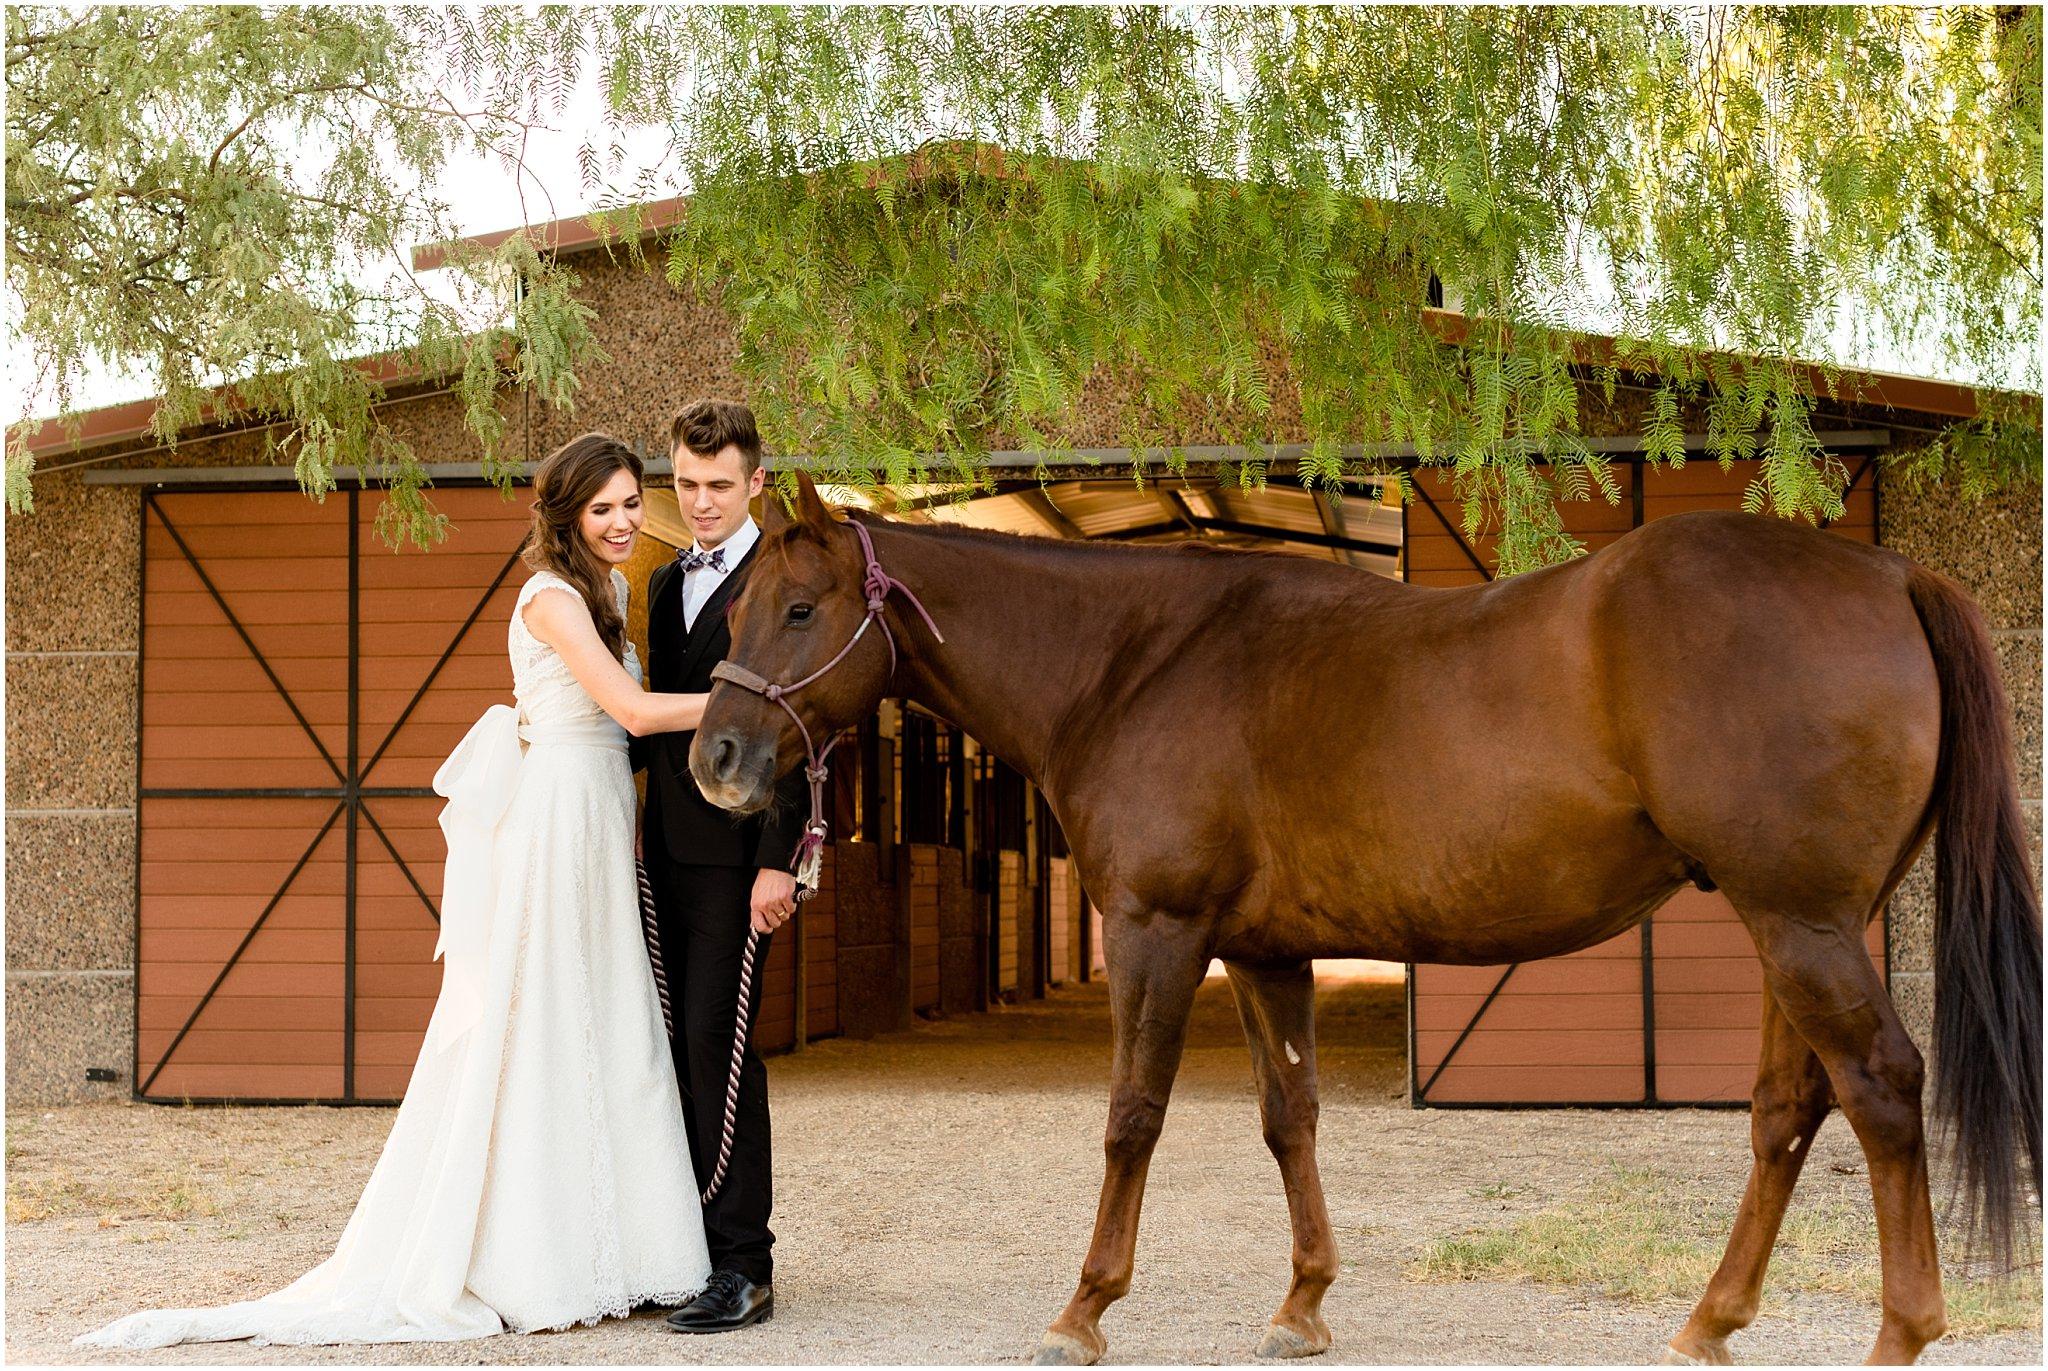 Tucson Candid Wedding Photographer